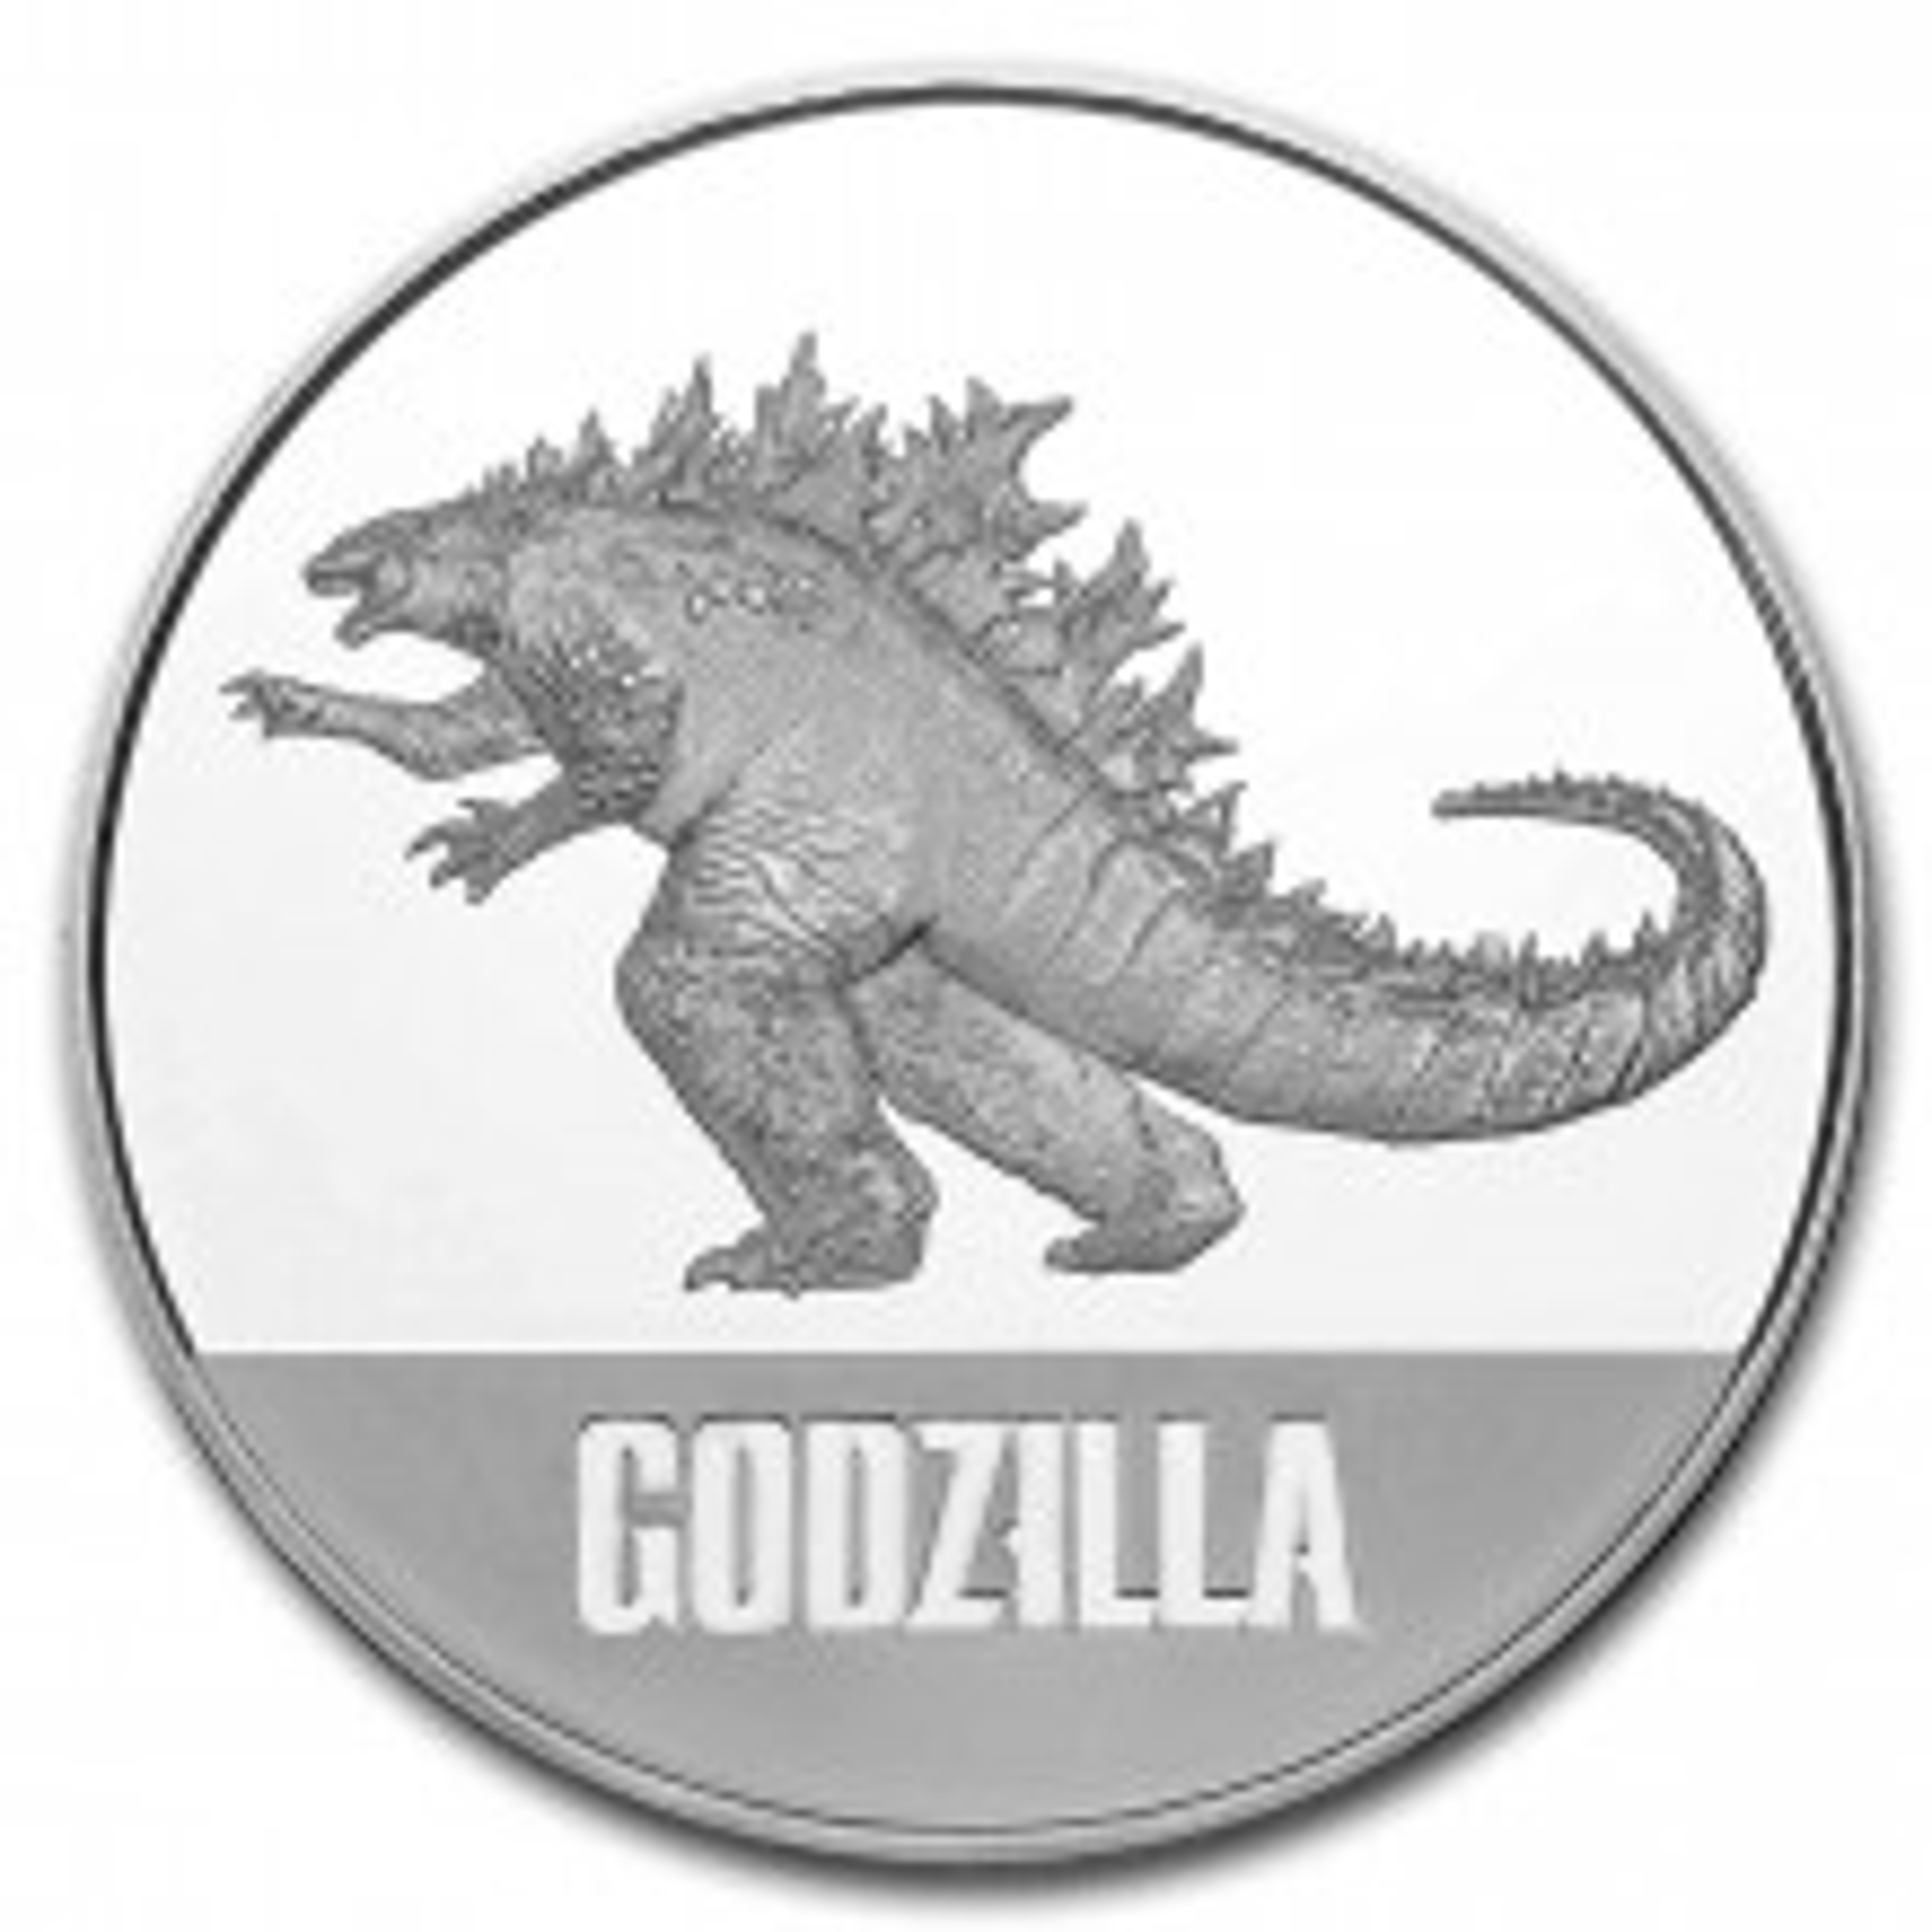 1 troy ounce zilveren munt Goldzilla 2021